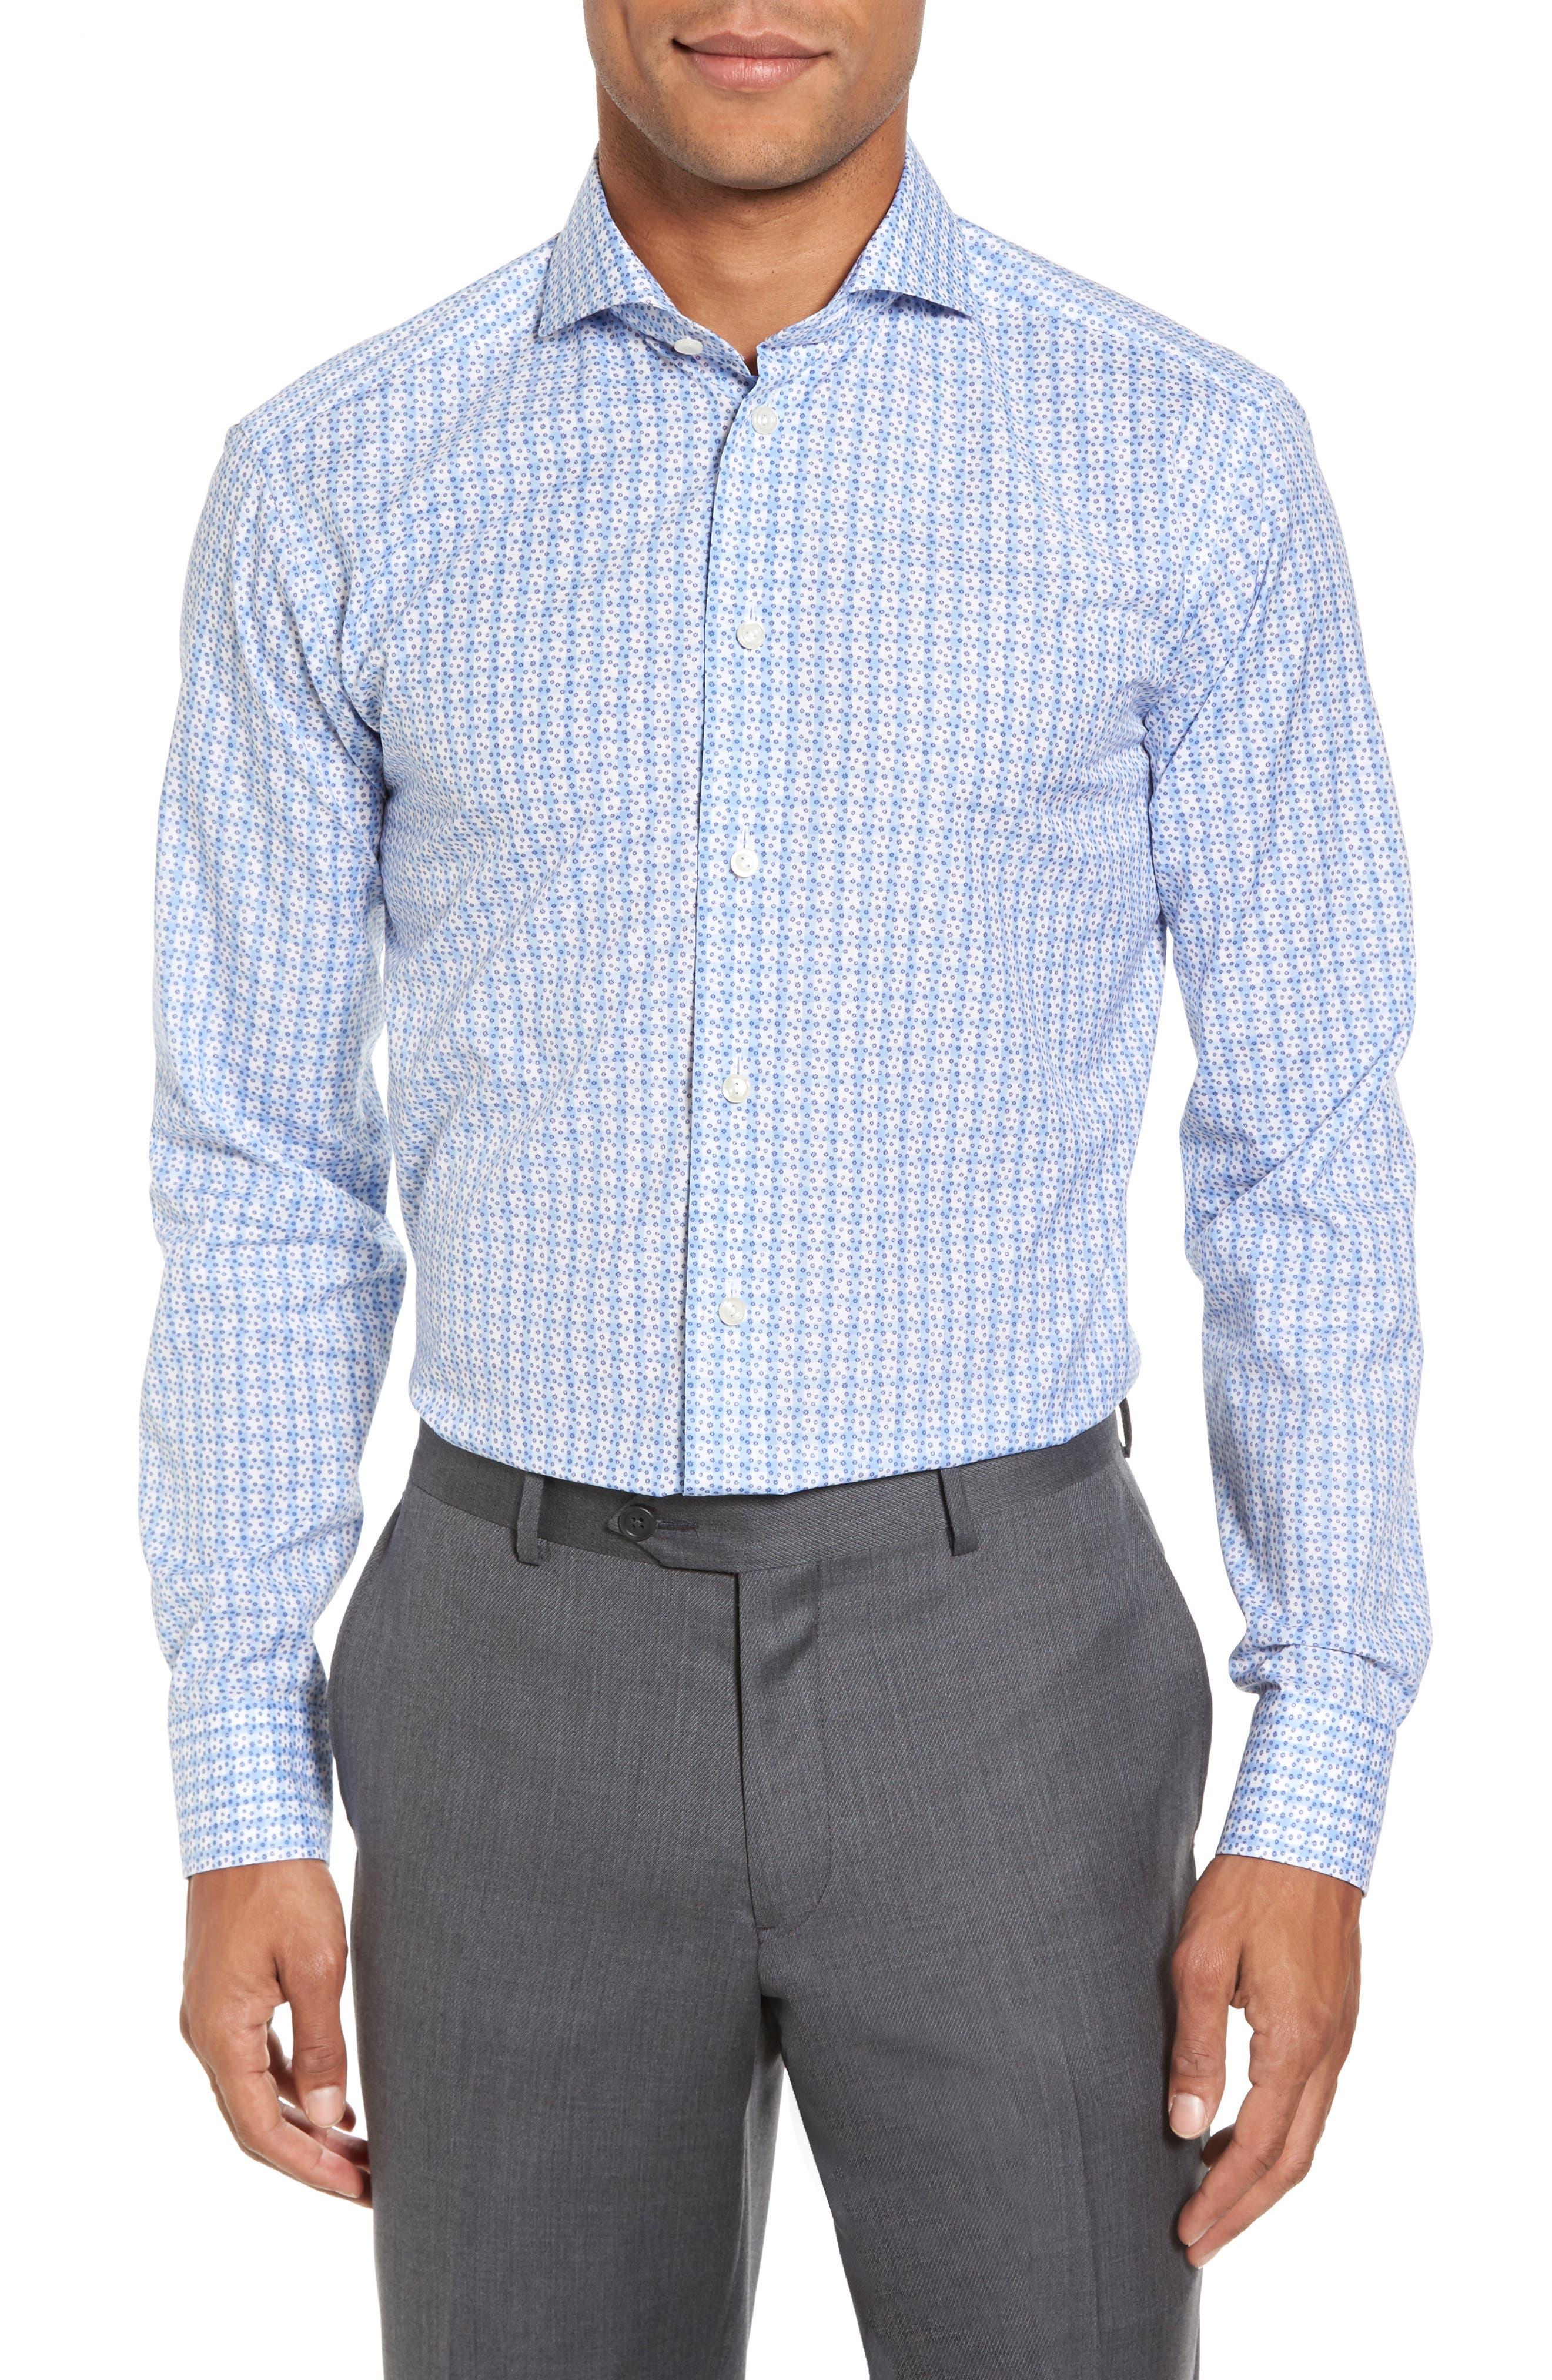 Alternate Image 2  - Eton Slim Fit Microprint Dress Shirt